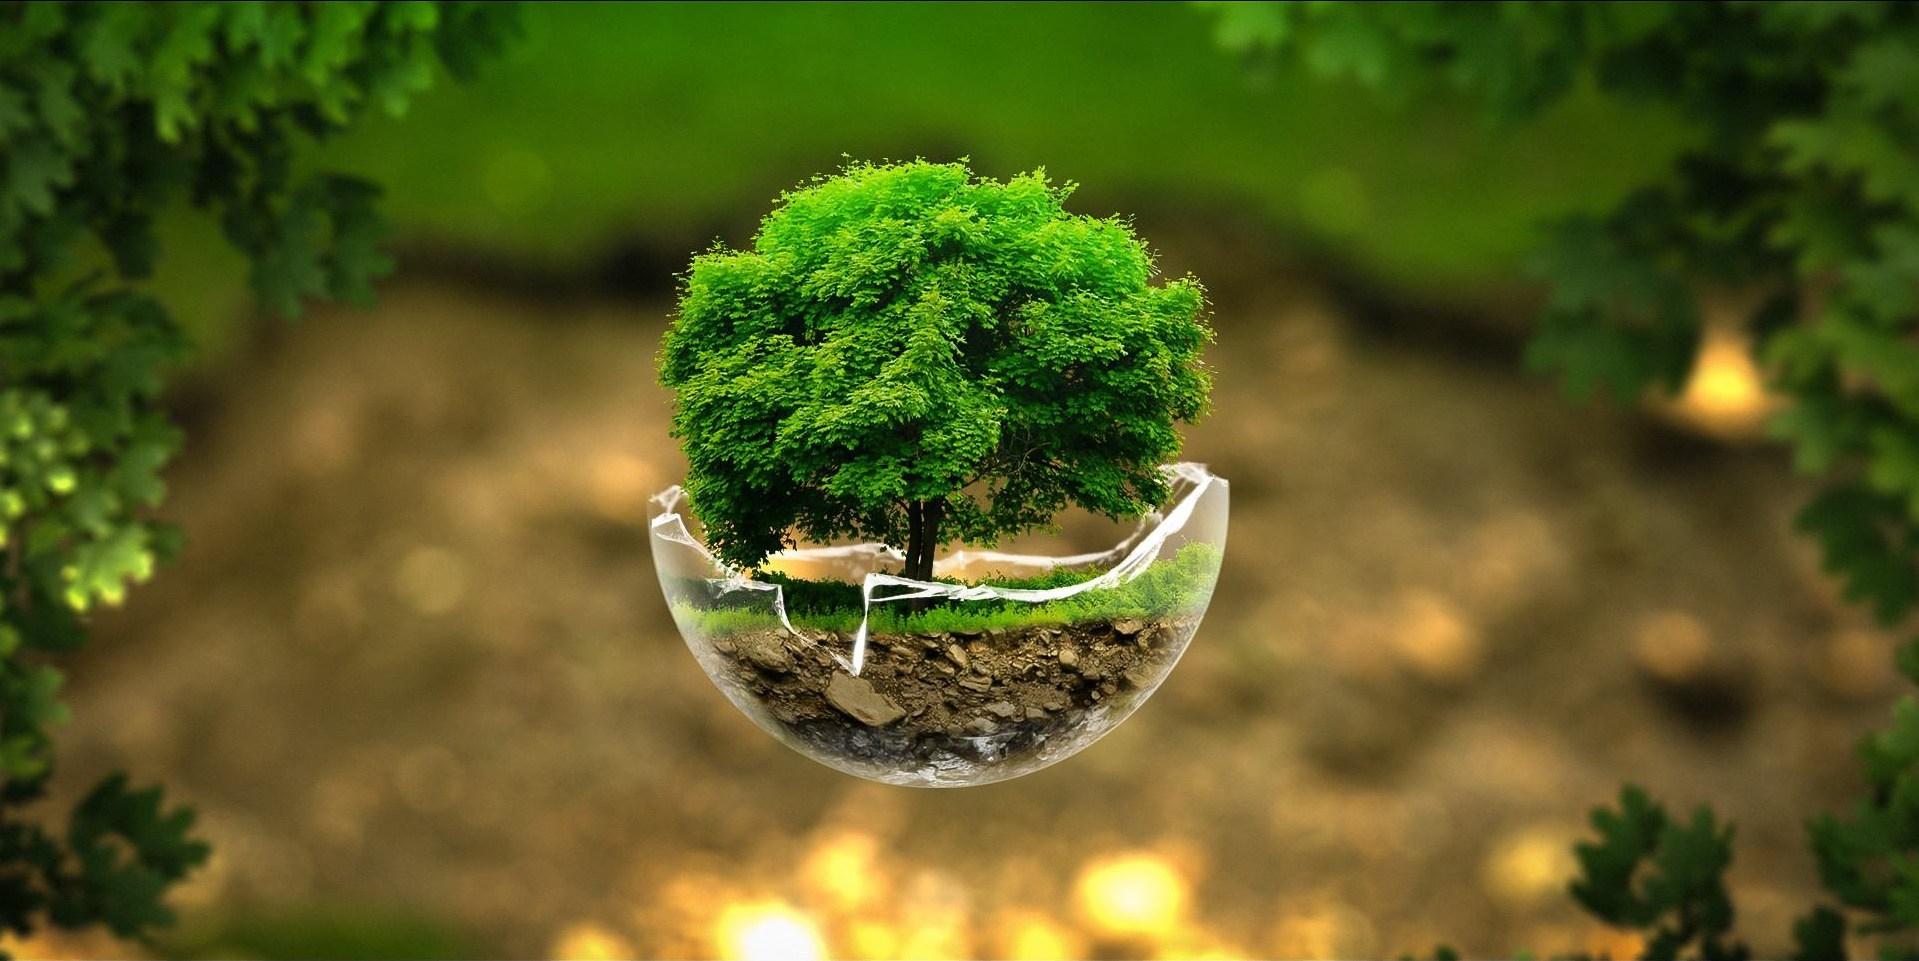 WORLD ENVIRONMENT DAY – BEAT PLASTIC POLLUTION